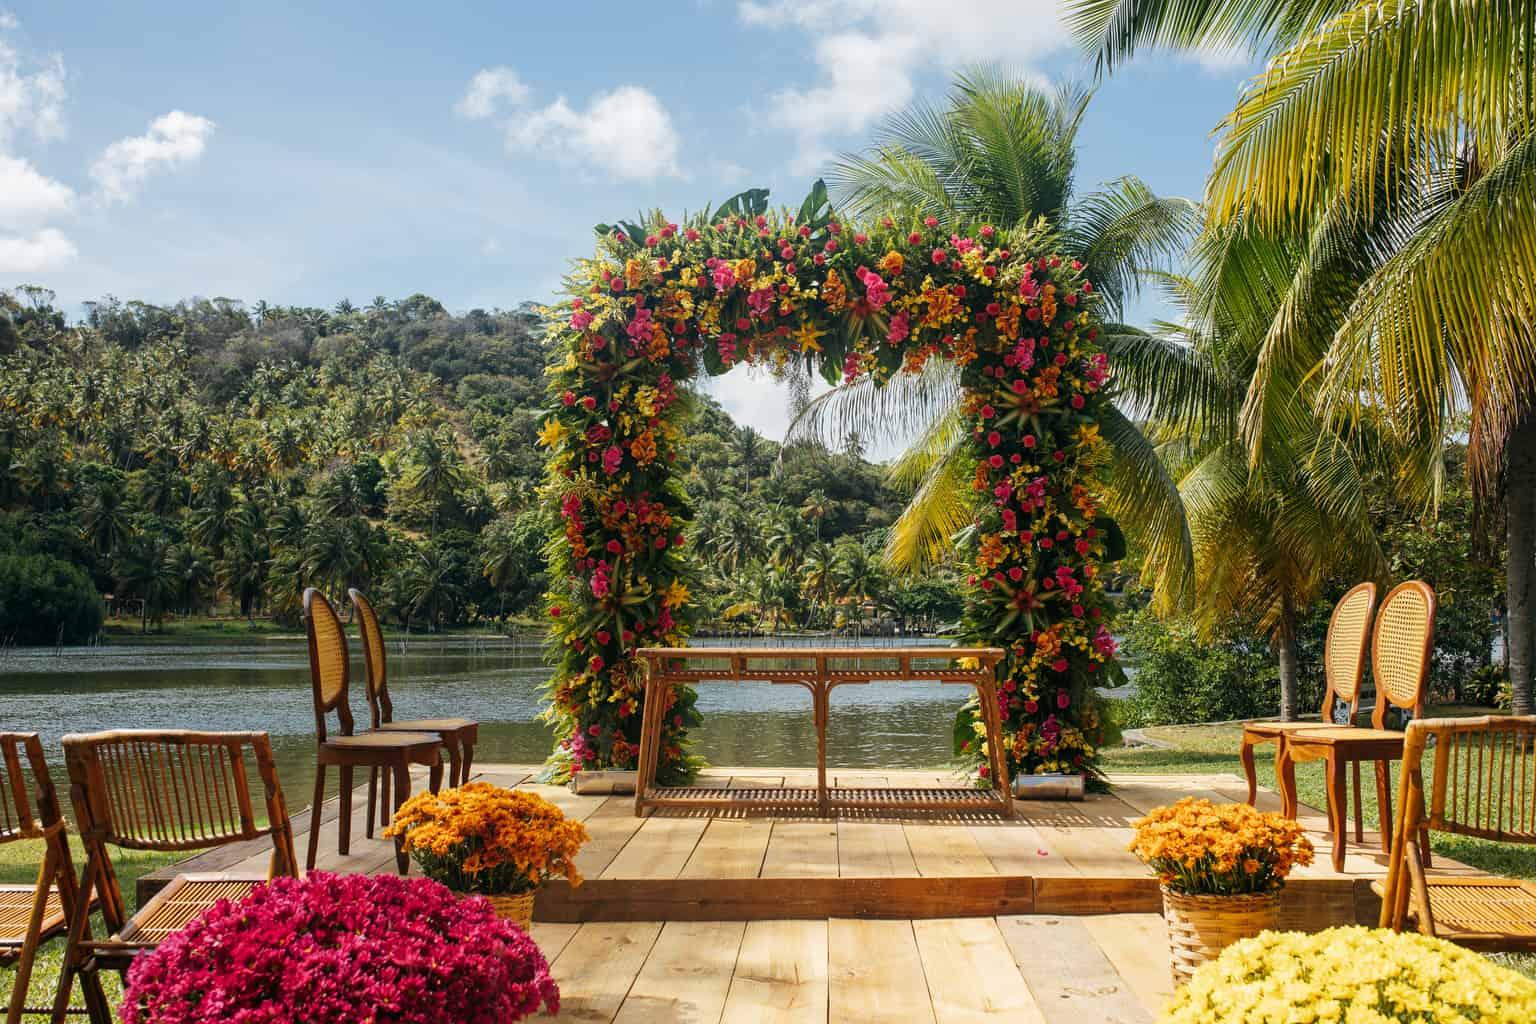 Casamento-Gardenia-e-Marcos-Antonio-Paulo-Bezerra-Joao-Curvelo-Carol-Maiorano-740-decoracao